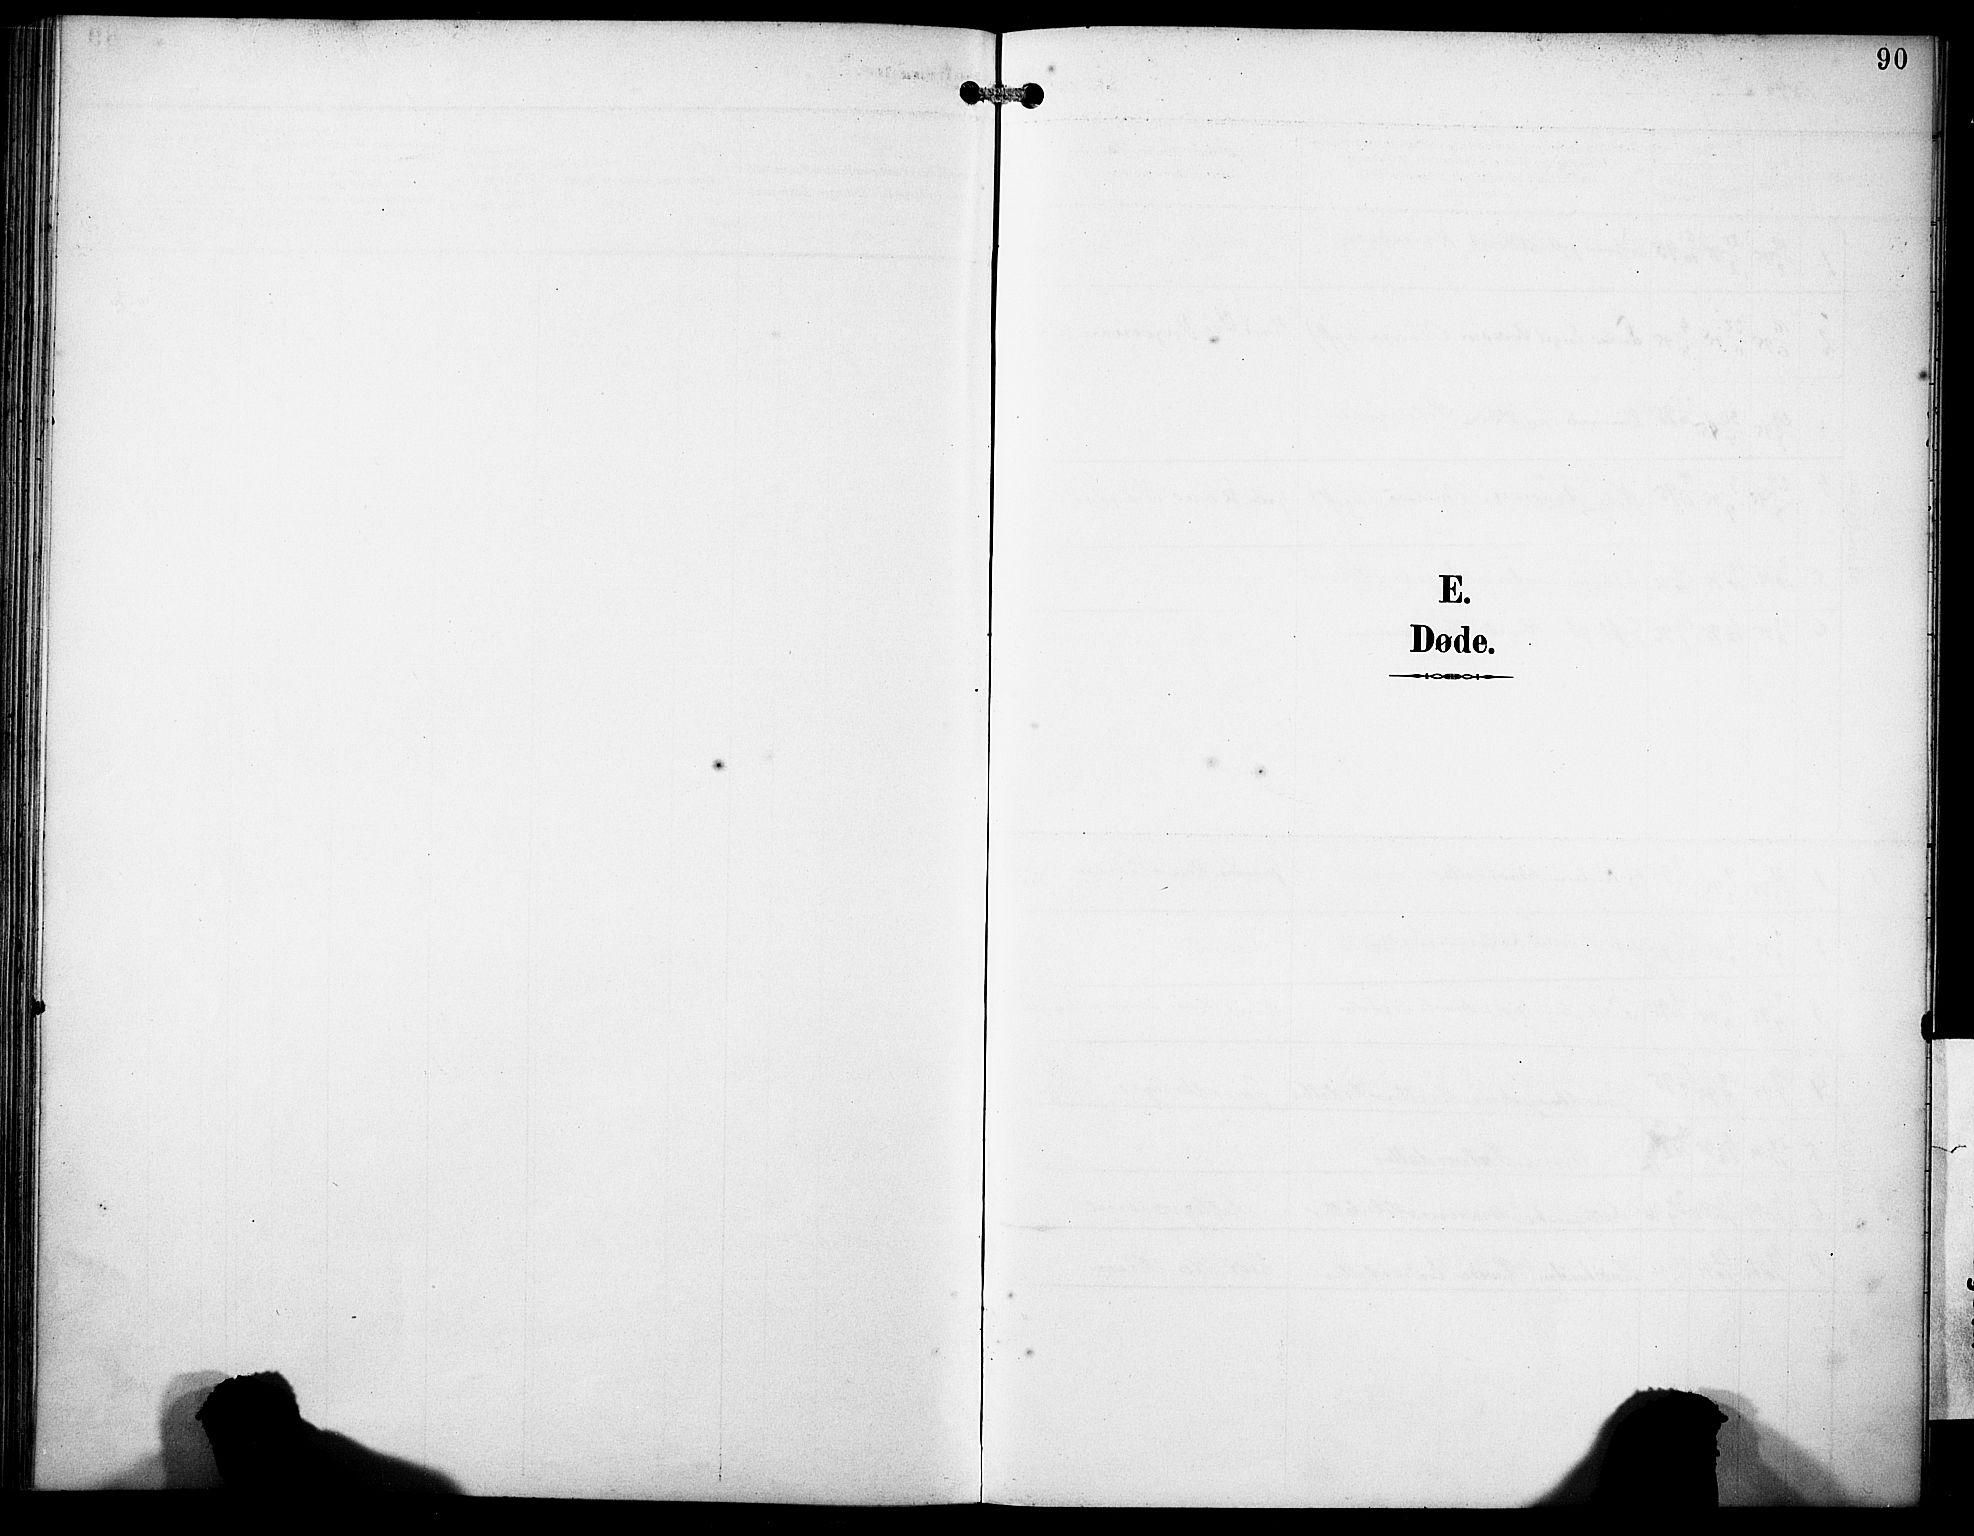 SAB, Finnås sokneprestembete, H/Ha/Haa/Haad/L0002: Ministerialbok nr. D 2, 1895-1906, s. 90